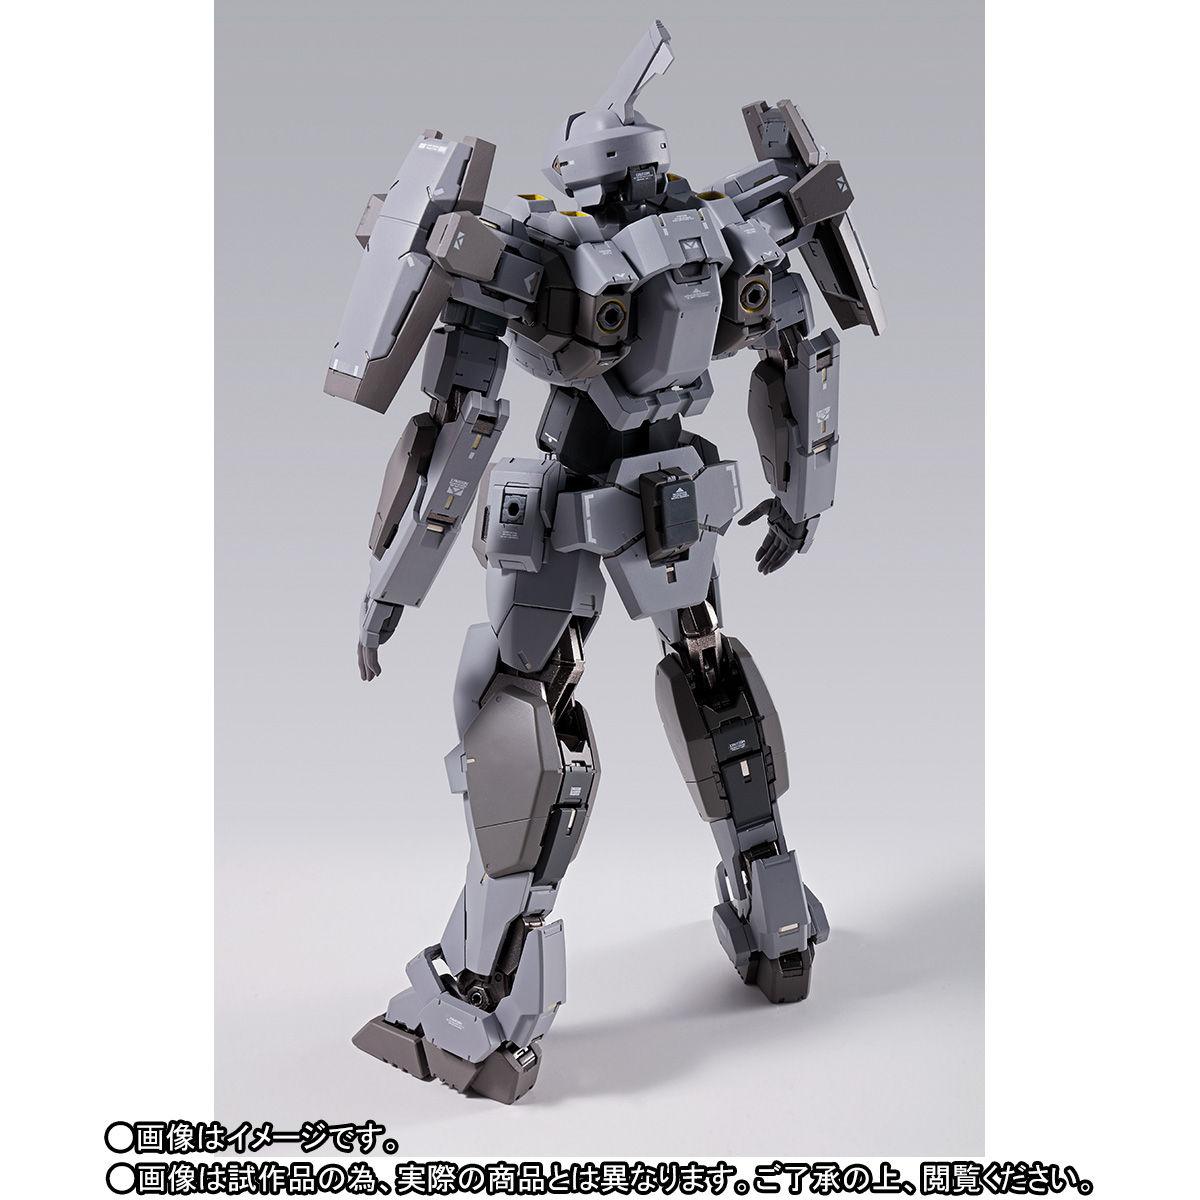 METAL BUILD『ガーンズバック Ver.IV|フルメタル・パニック!IV』可動フィギュア-005